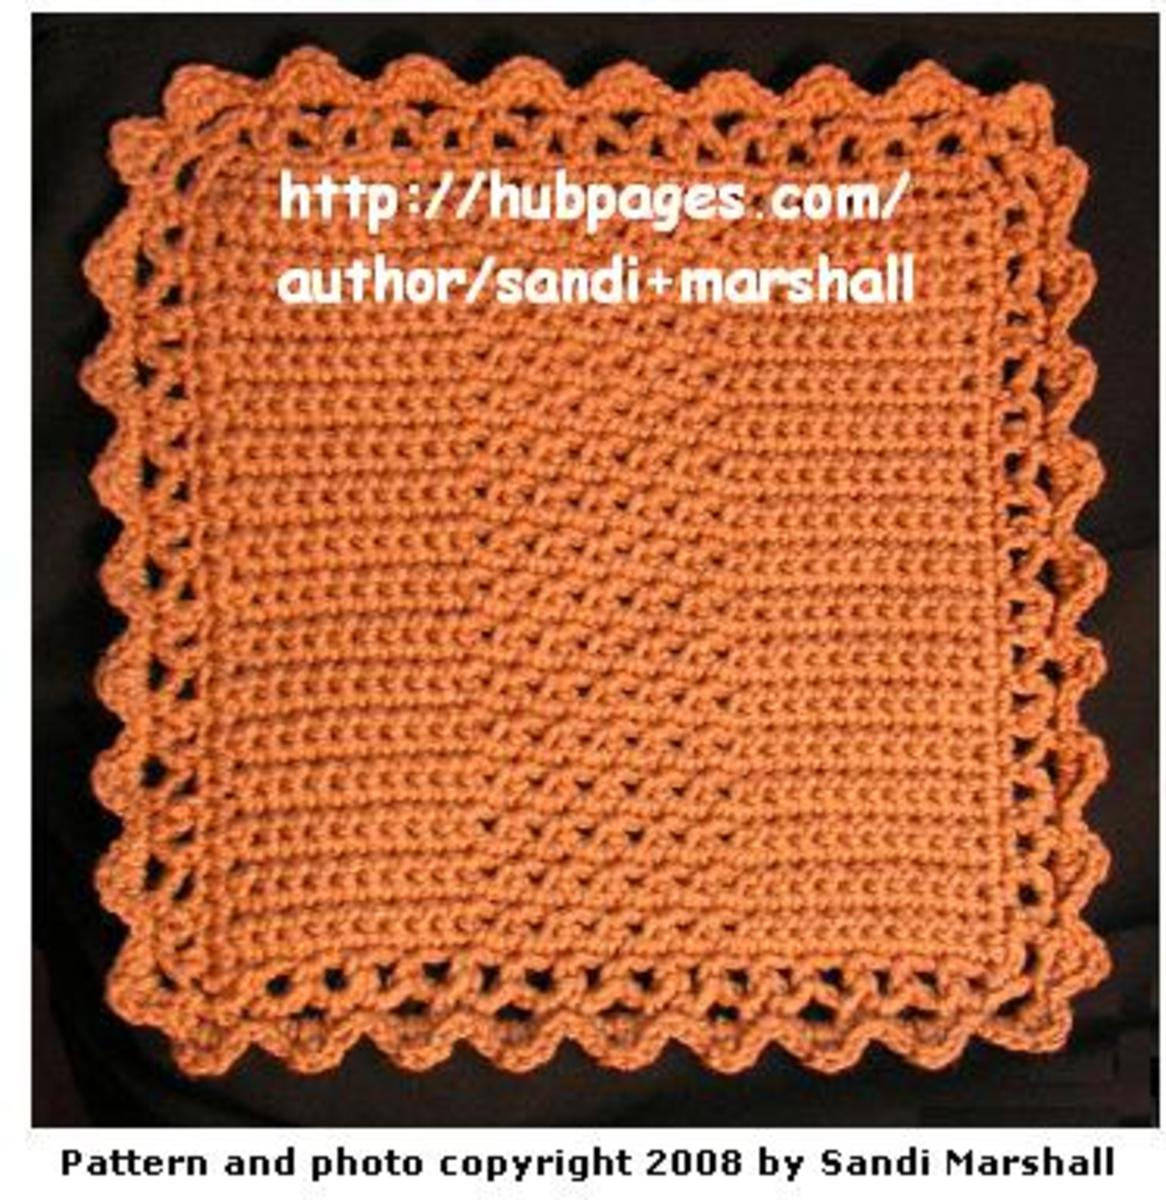 Knitting Pattern Central Dishcloths : CROCHET APPLE DISHCLOTH PATTERNS Crochet Patterns Only